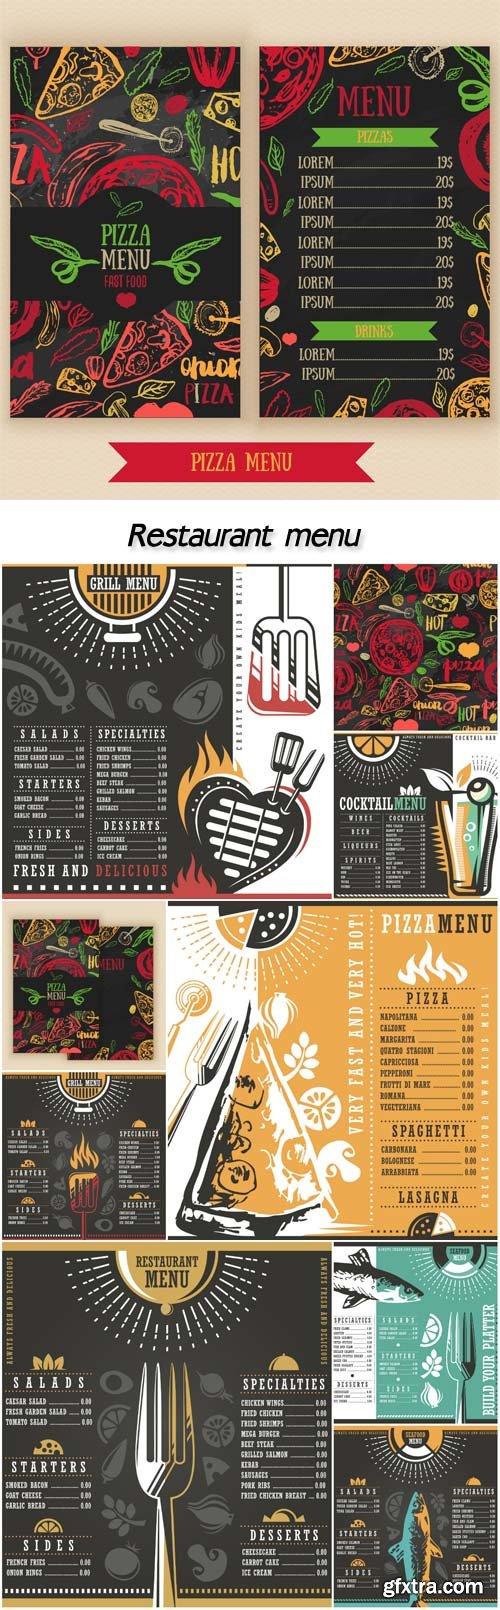 Restaurant menu, seafood, grill, pizzeria